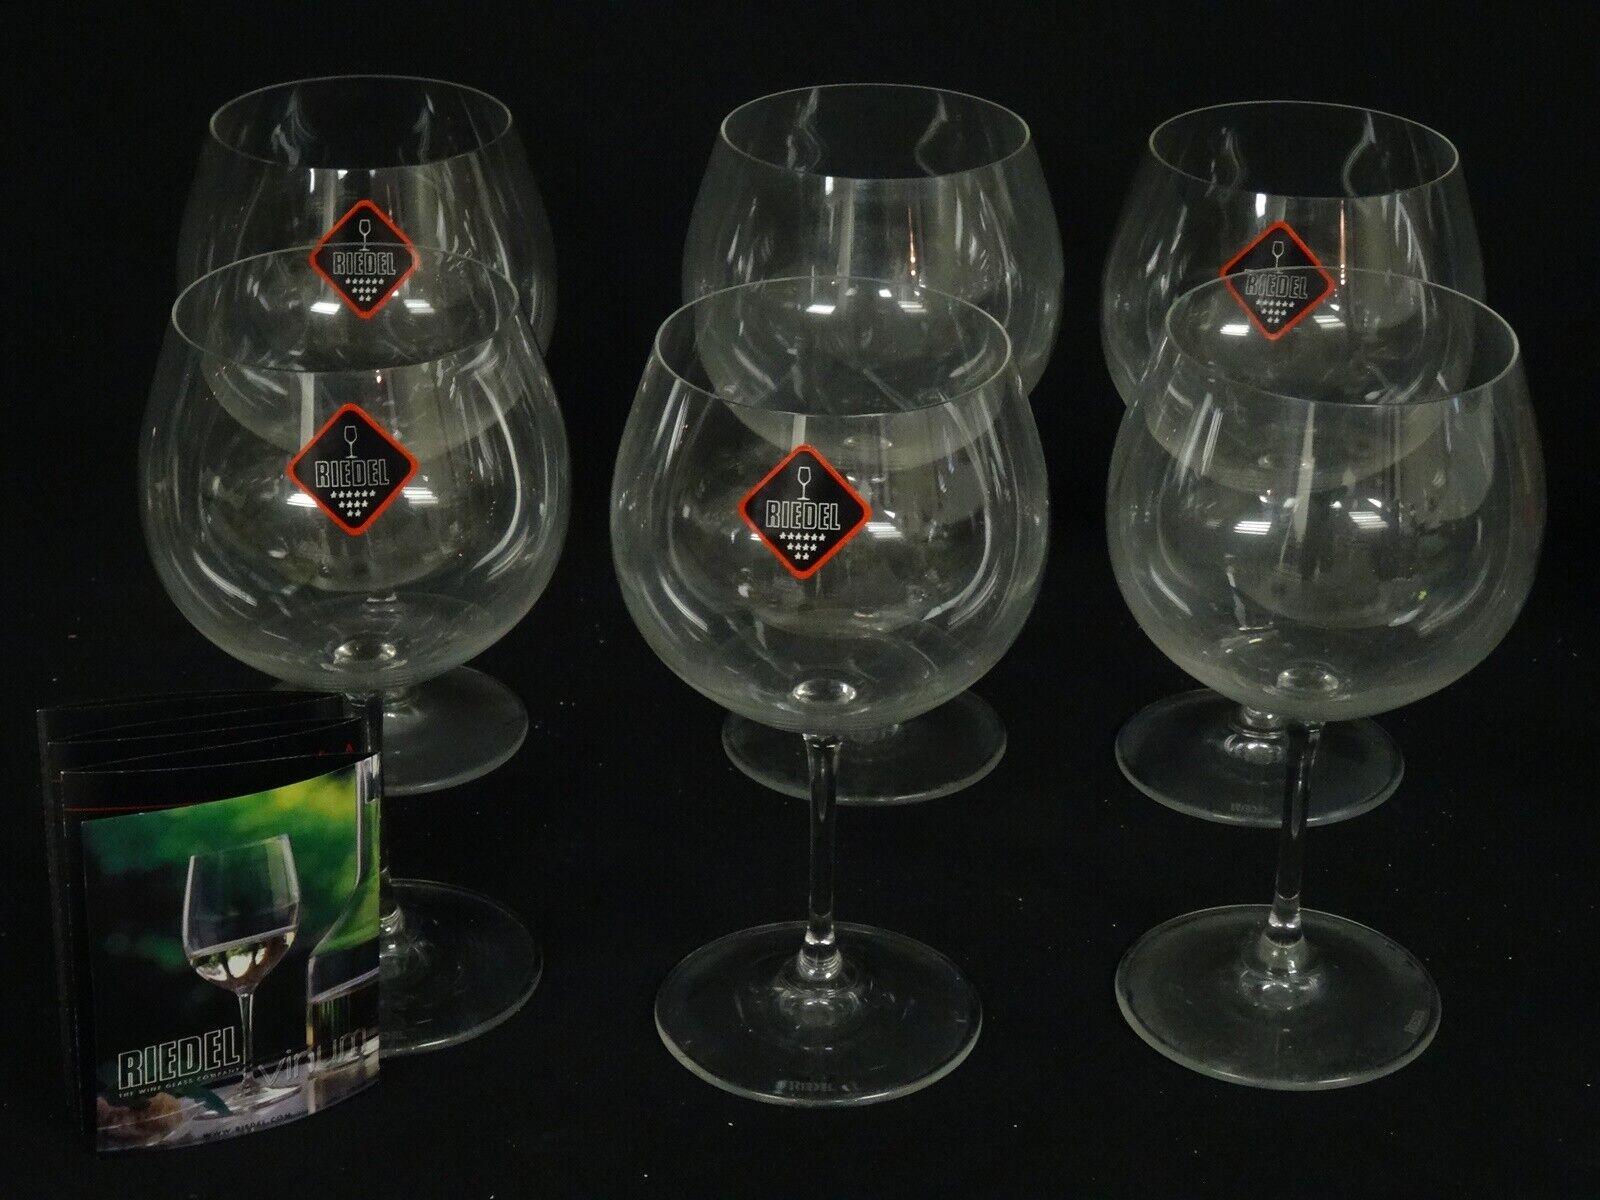 LOT OF 6 RIEDEL Crystal CHARdamenY MONTRACHET 6416 97 600 CCM WINE GOBLET  7.5